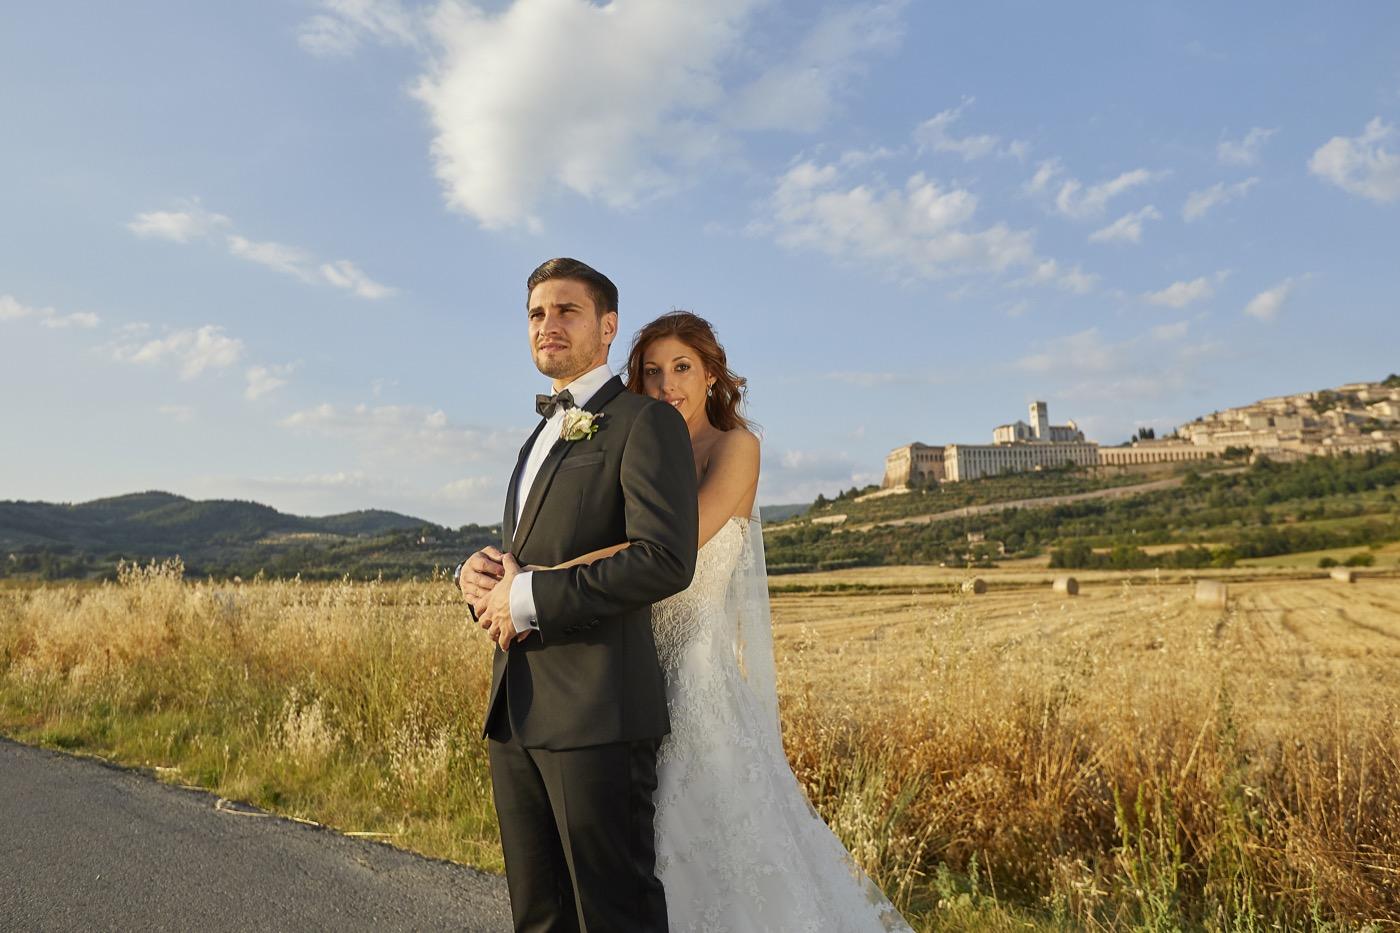 Claudio-Coppola-wedding-photographer-abbazia-7-frati-piegaro-65